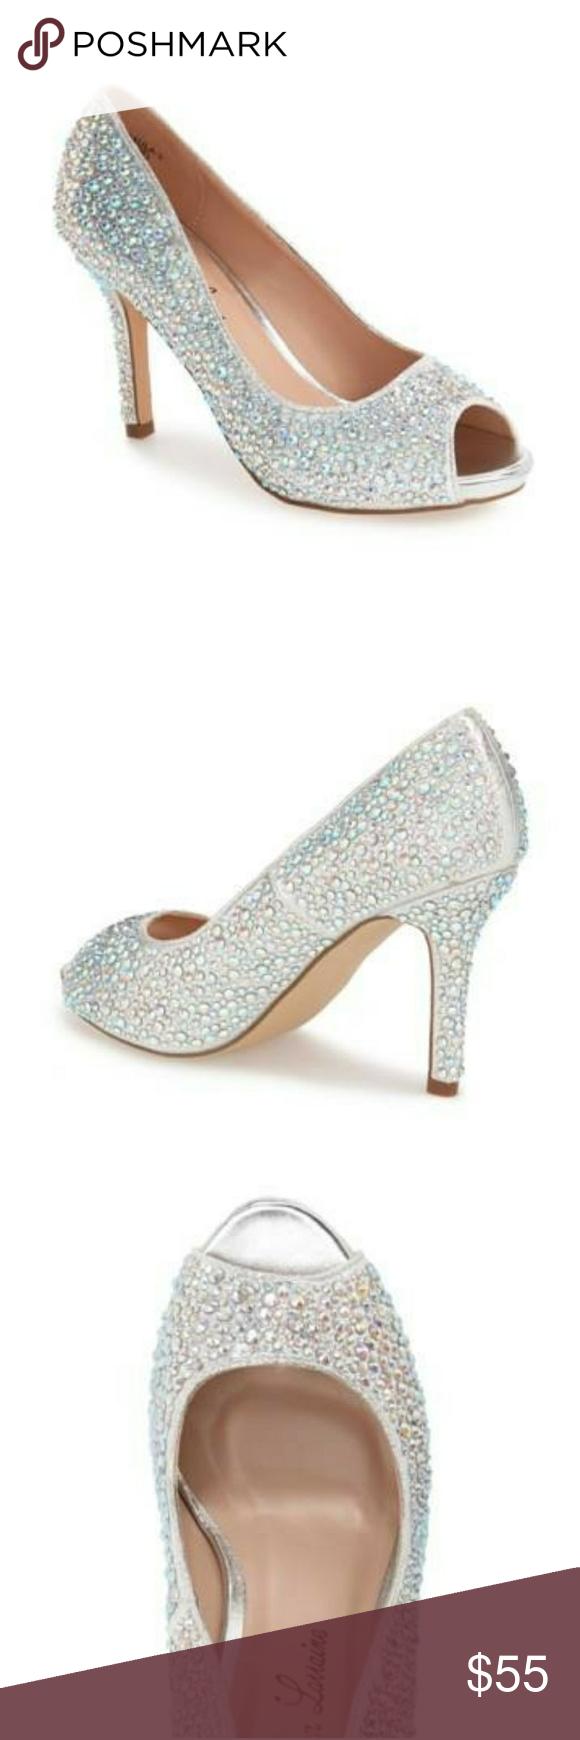 Lauren Lorraine Paula 3 Peep Toe Heel | Heels, Peep toe